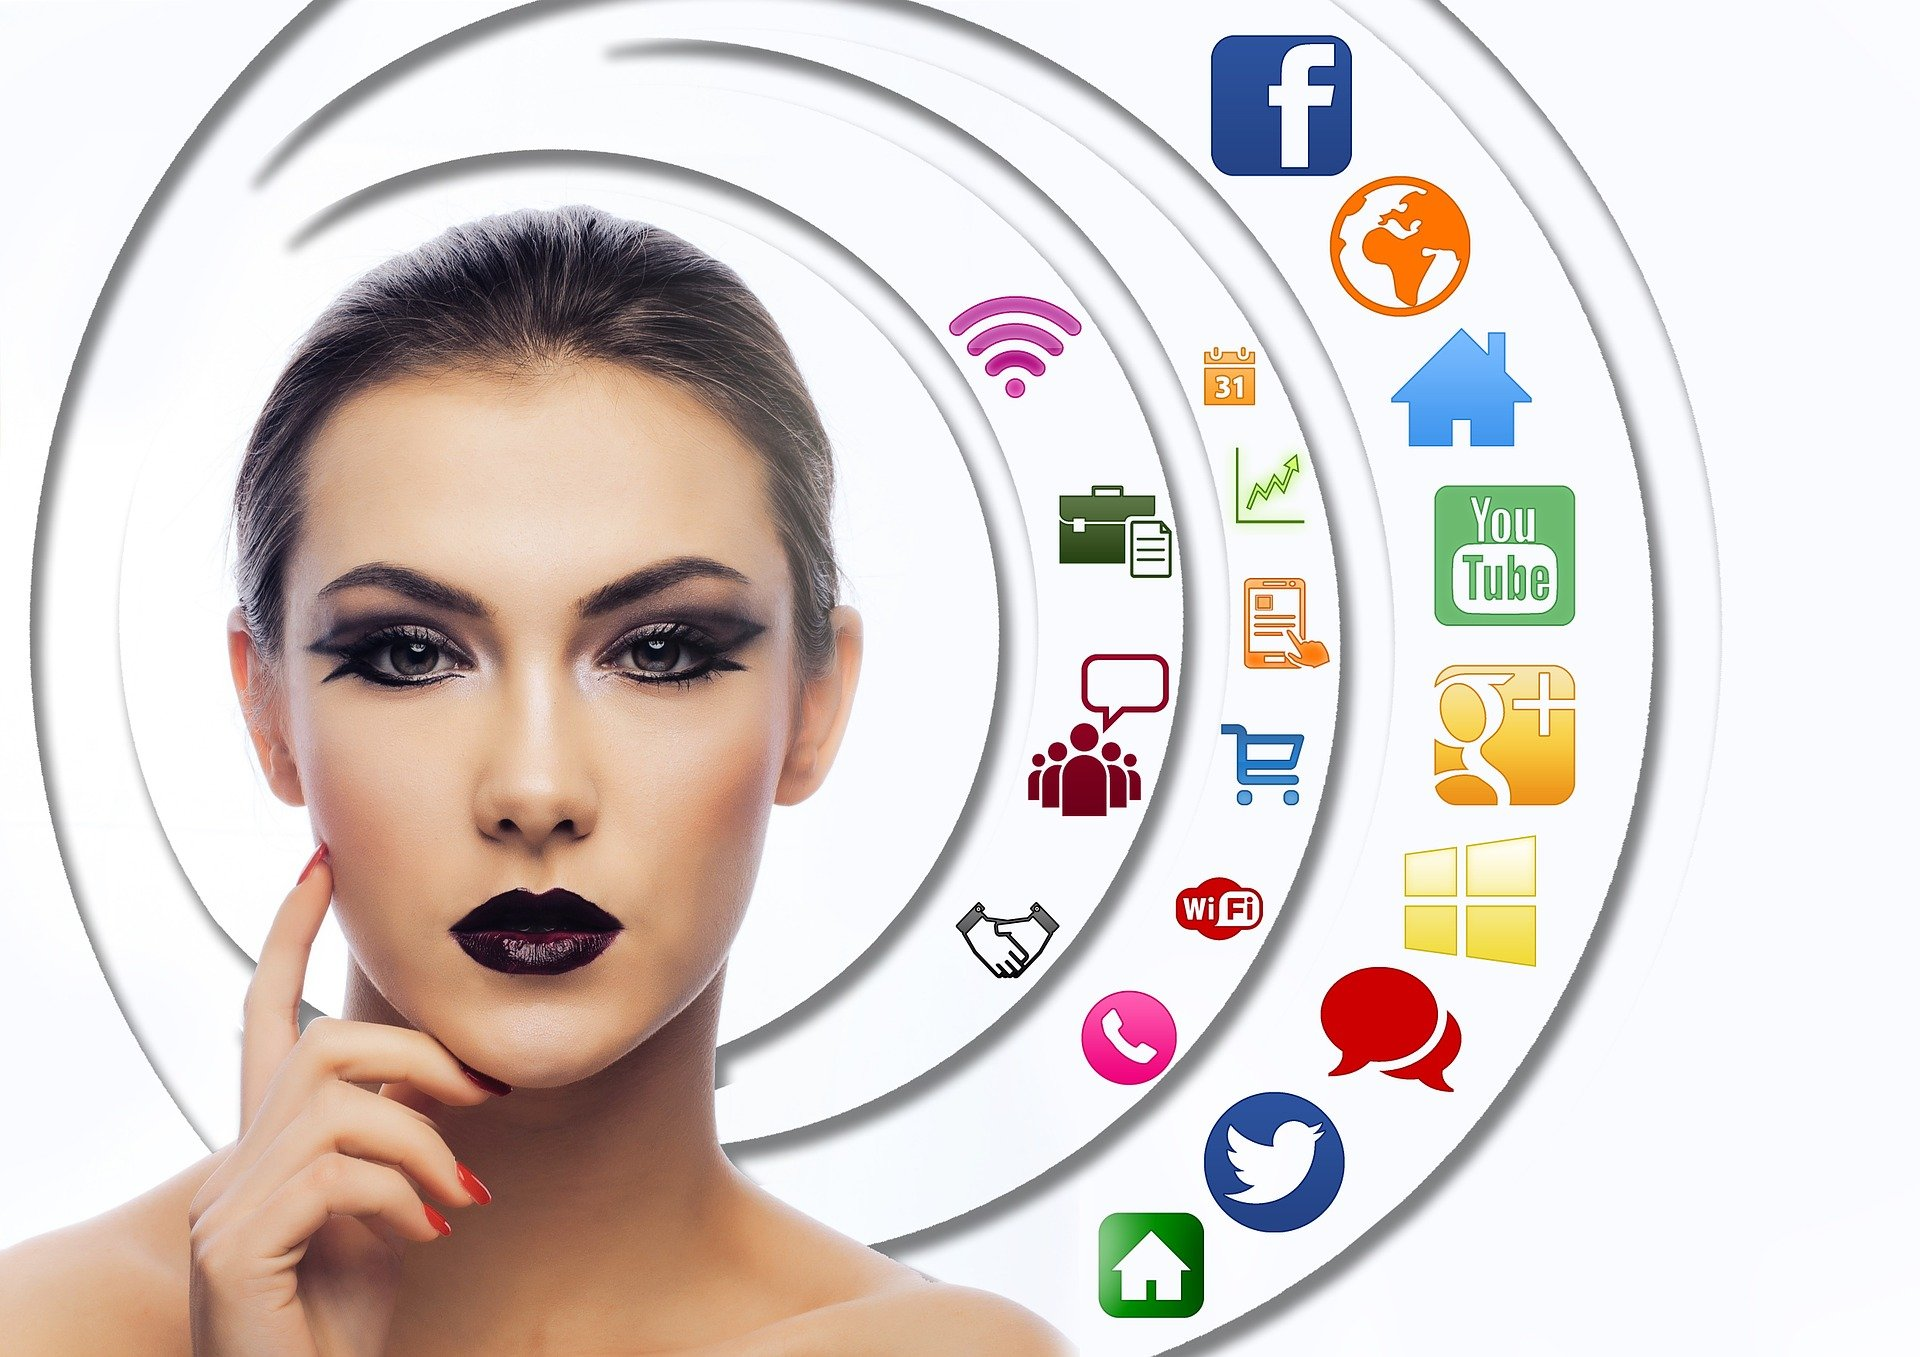 webprojekt-chemnitz-social-media-women-auswahl